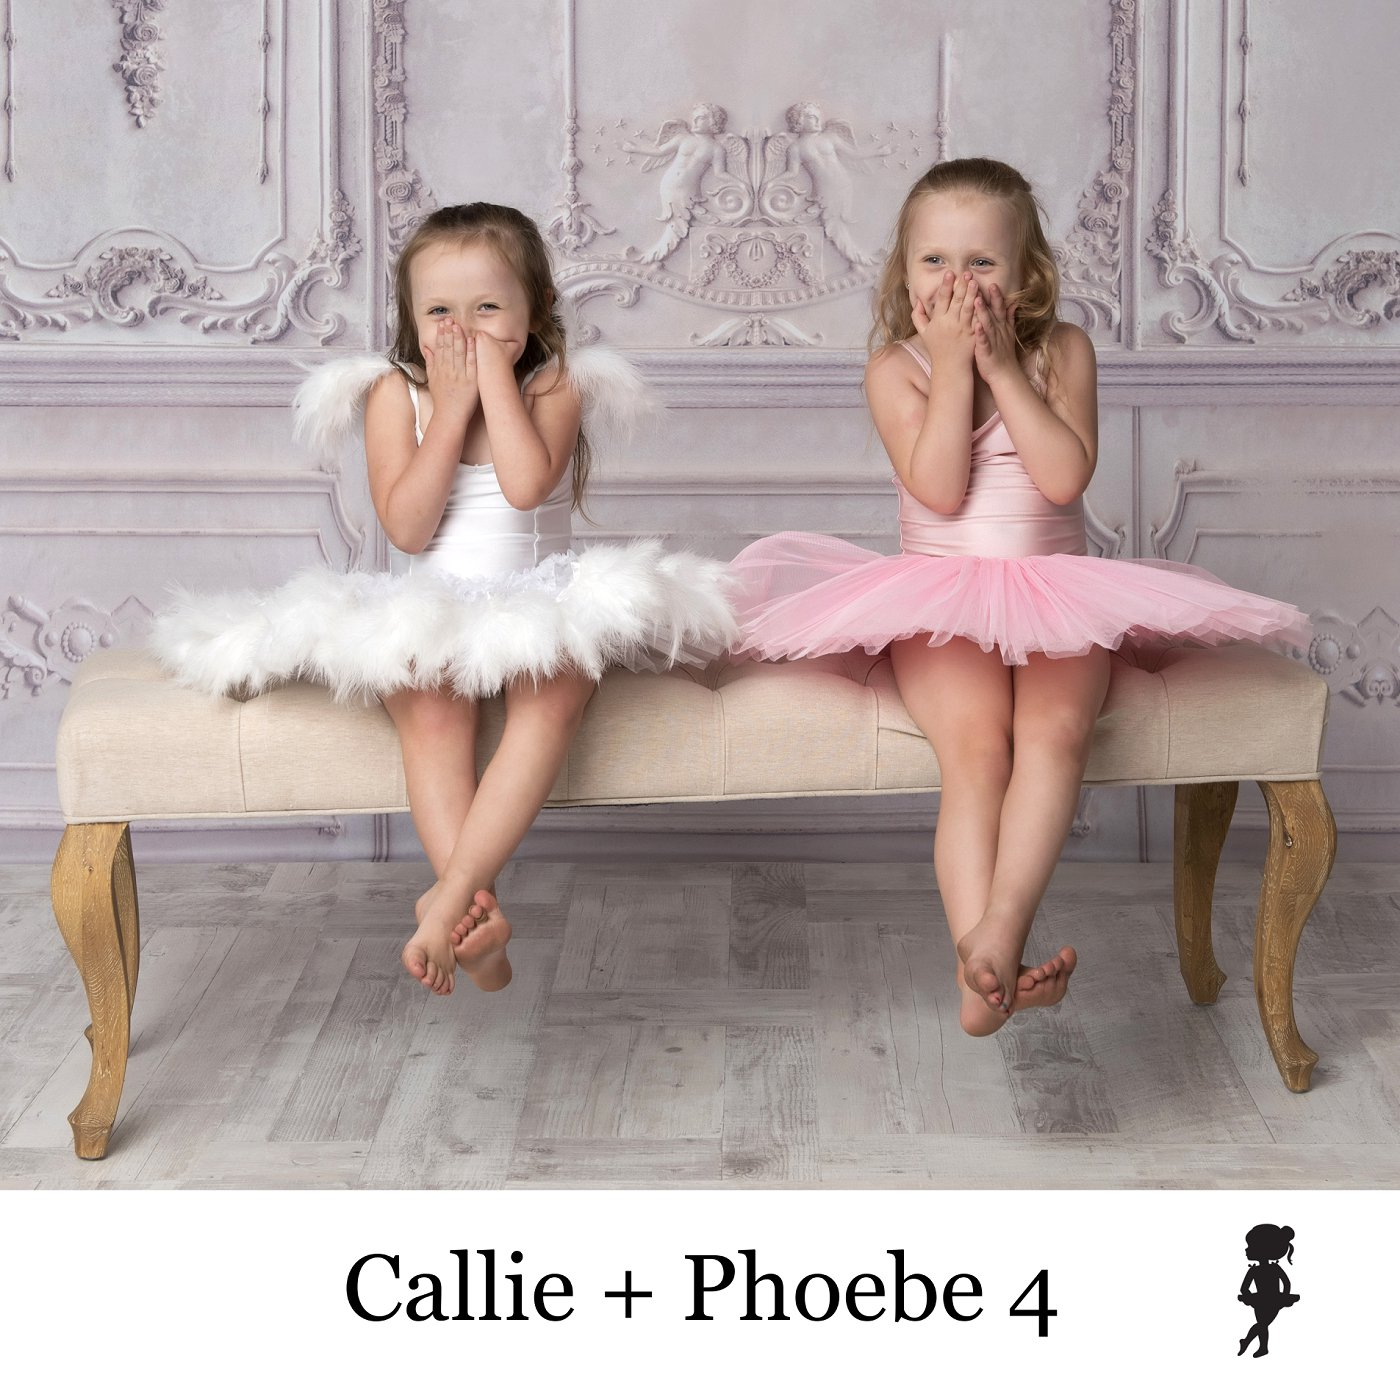 LB0319-Callie and Phoebe 4.jpg